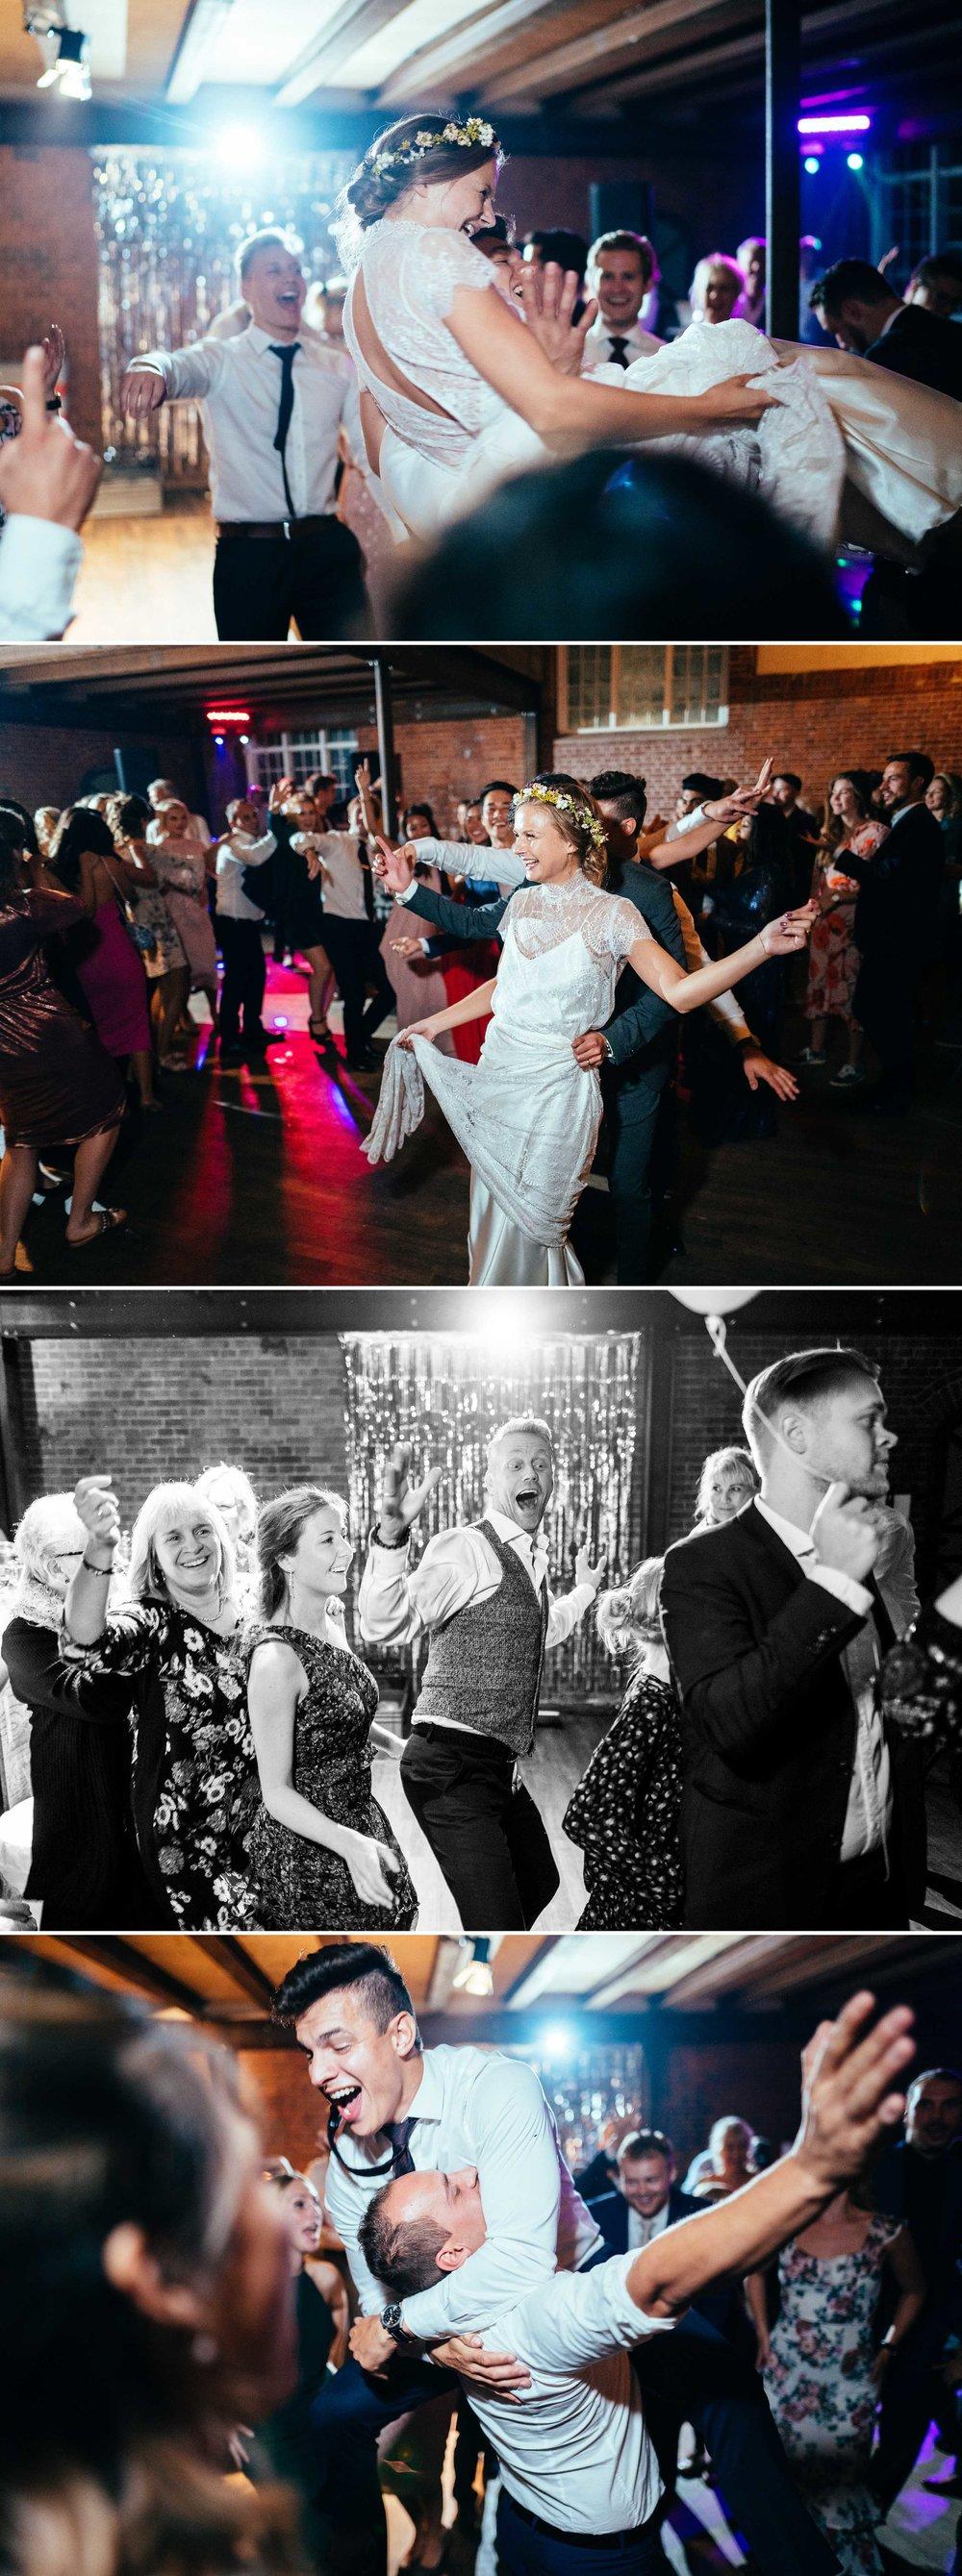 bryllupsgæster-og-brudepar-der-danser.jpg